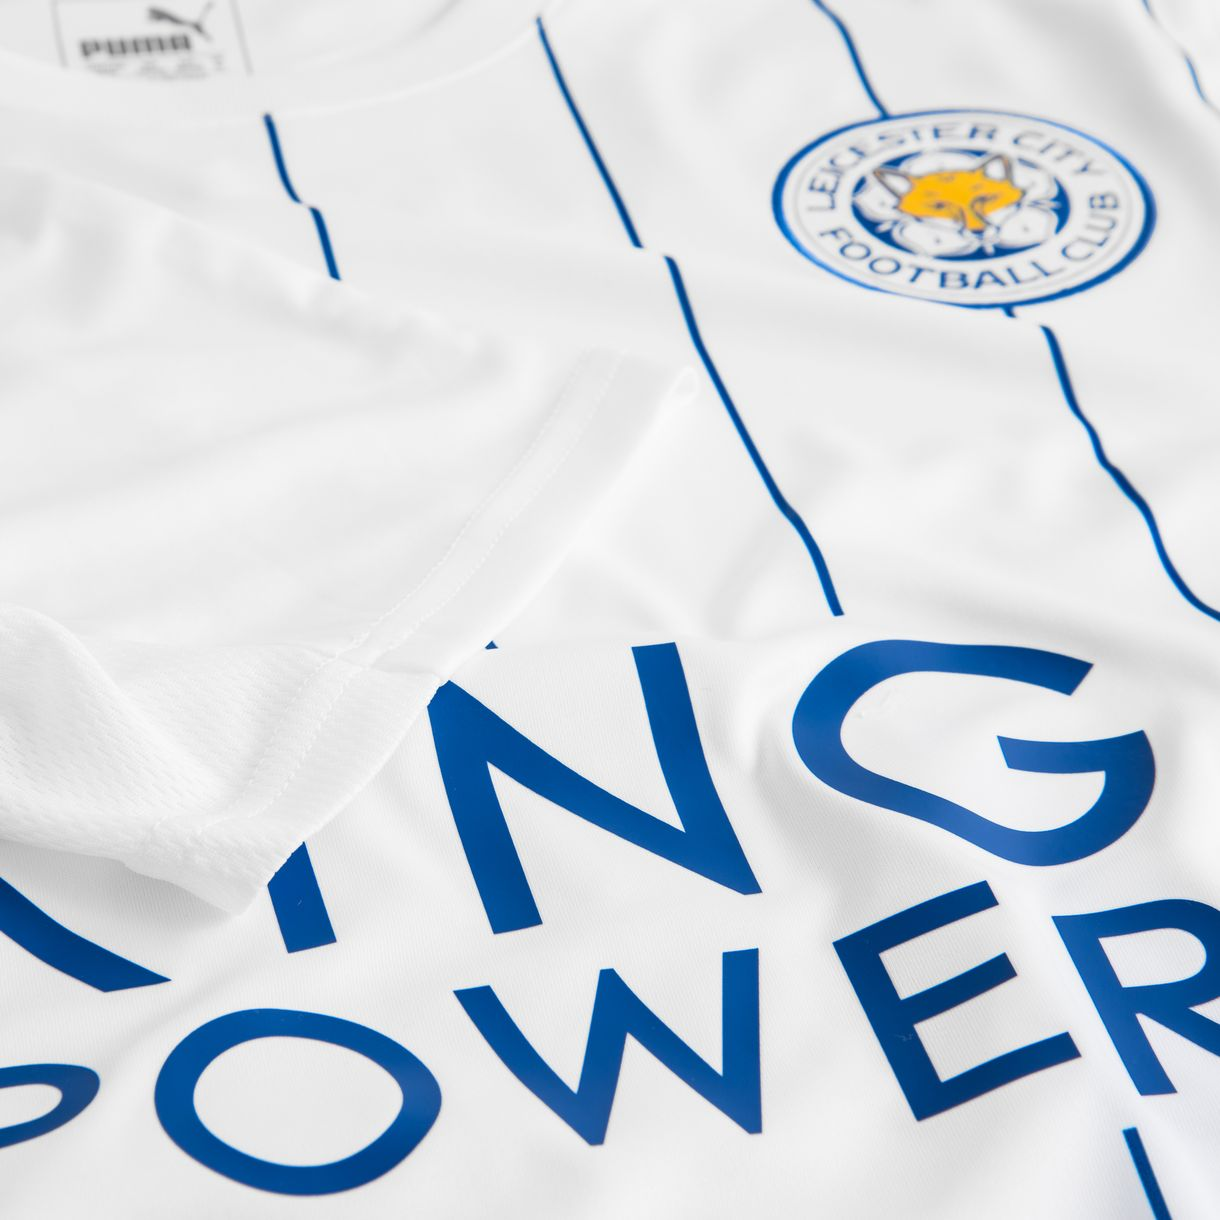 Design your own t-shirt leicester - 2016 2017 Leicester City Puma Third Football Shirt Kids K1814021zr Uksoccershop